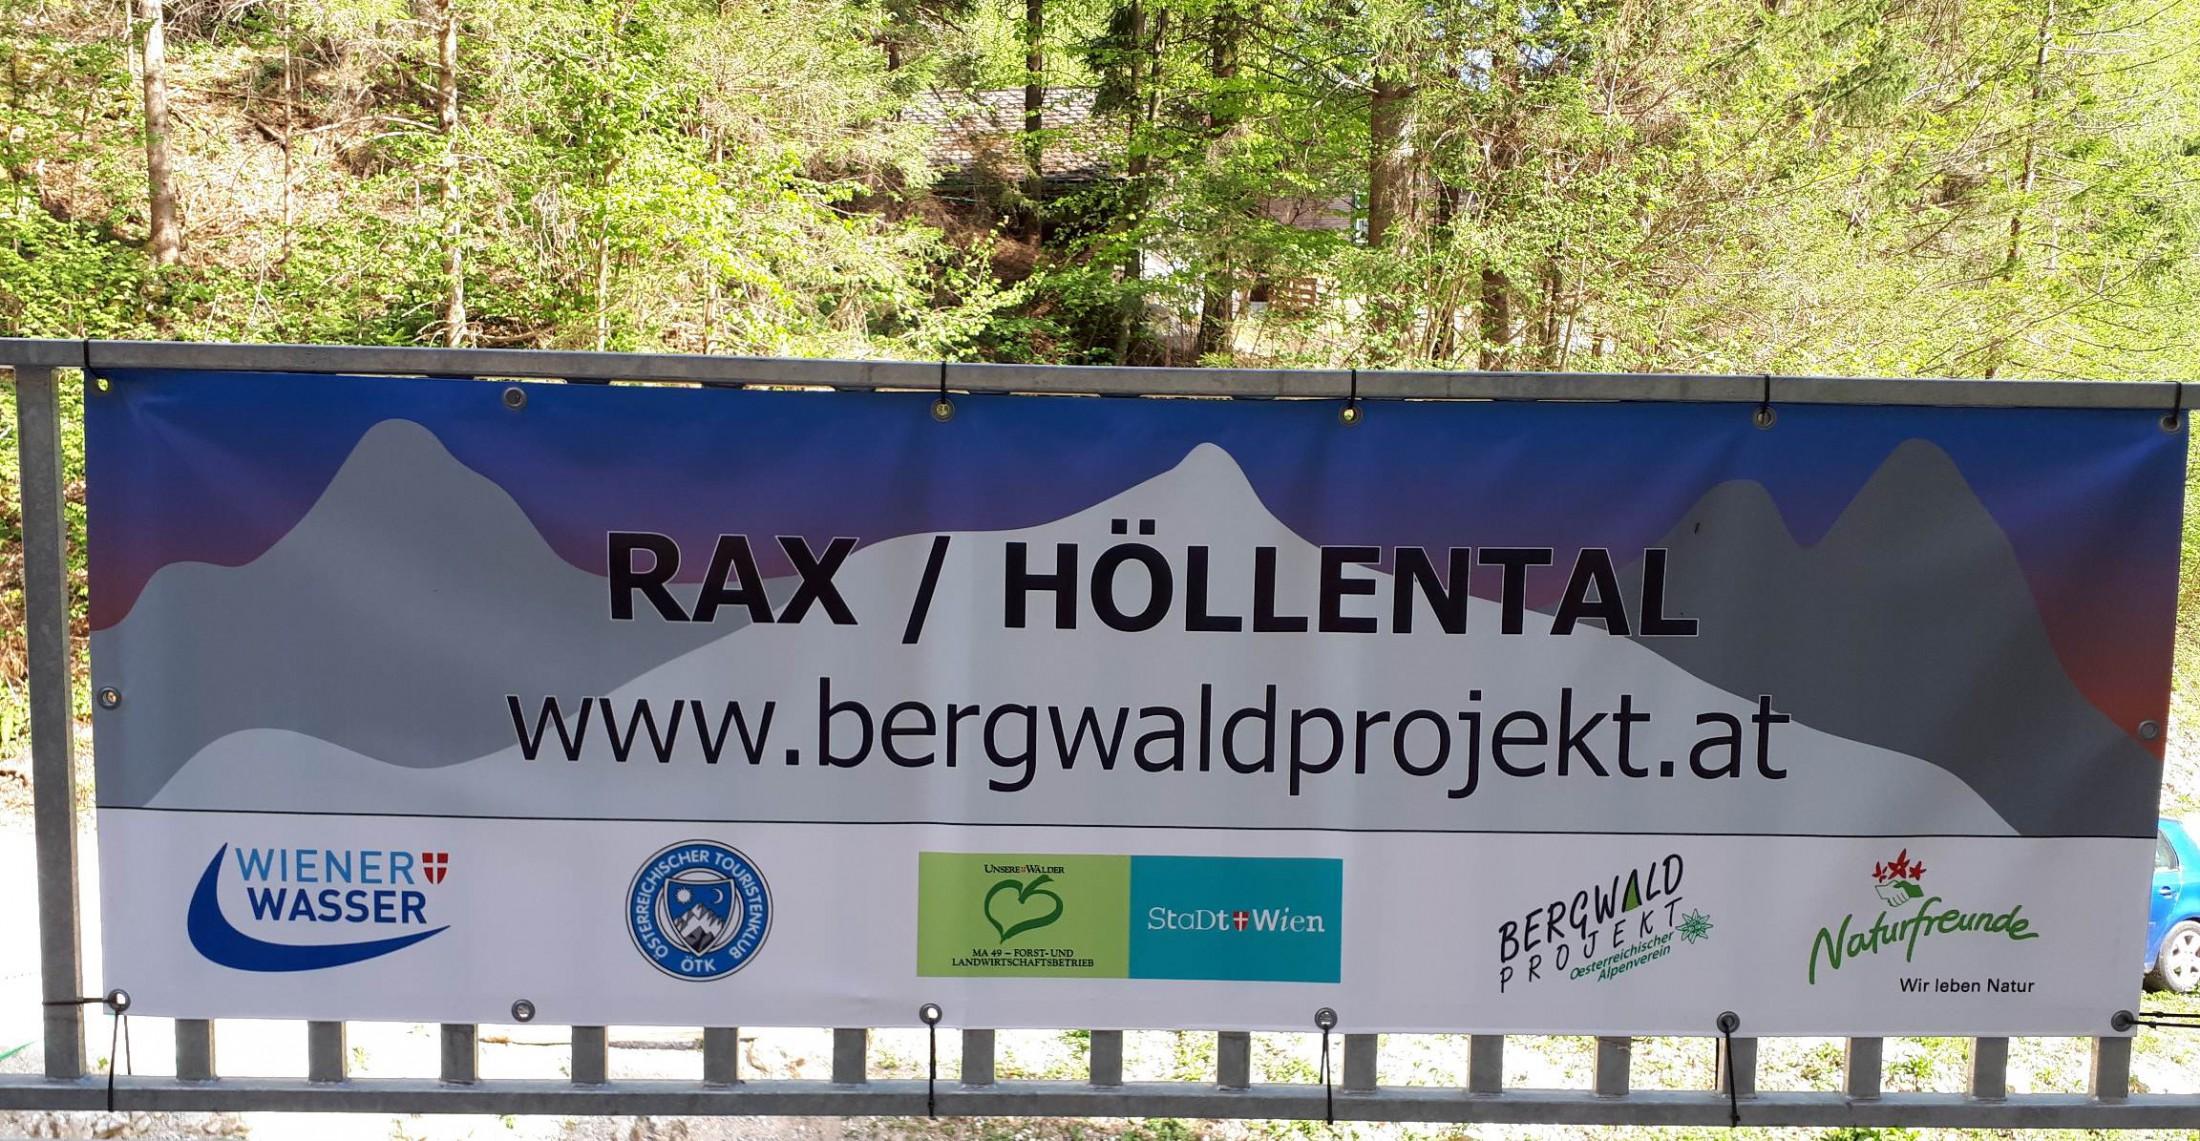 Bergwaldprojekt 2018 im Höllental